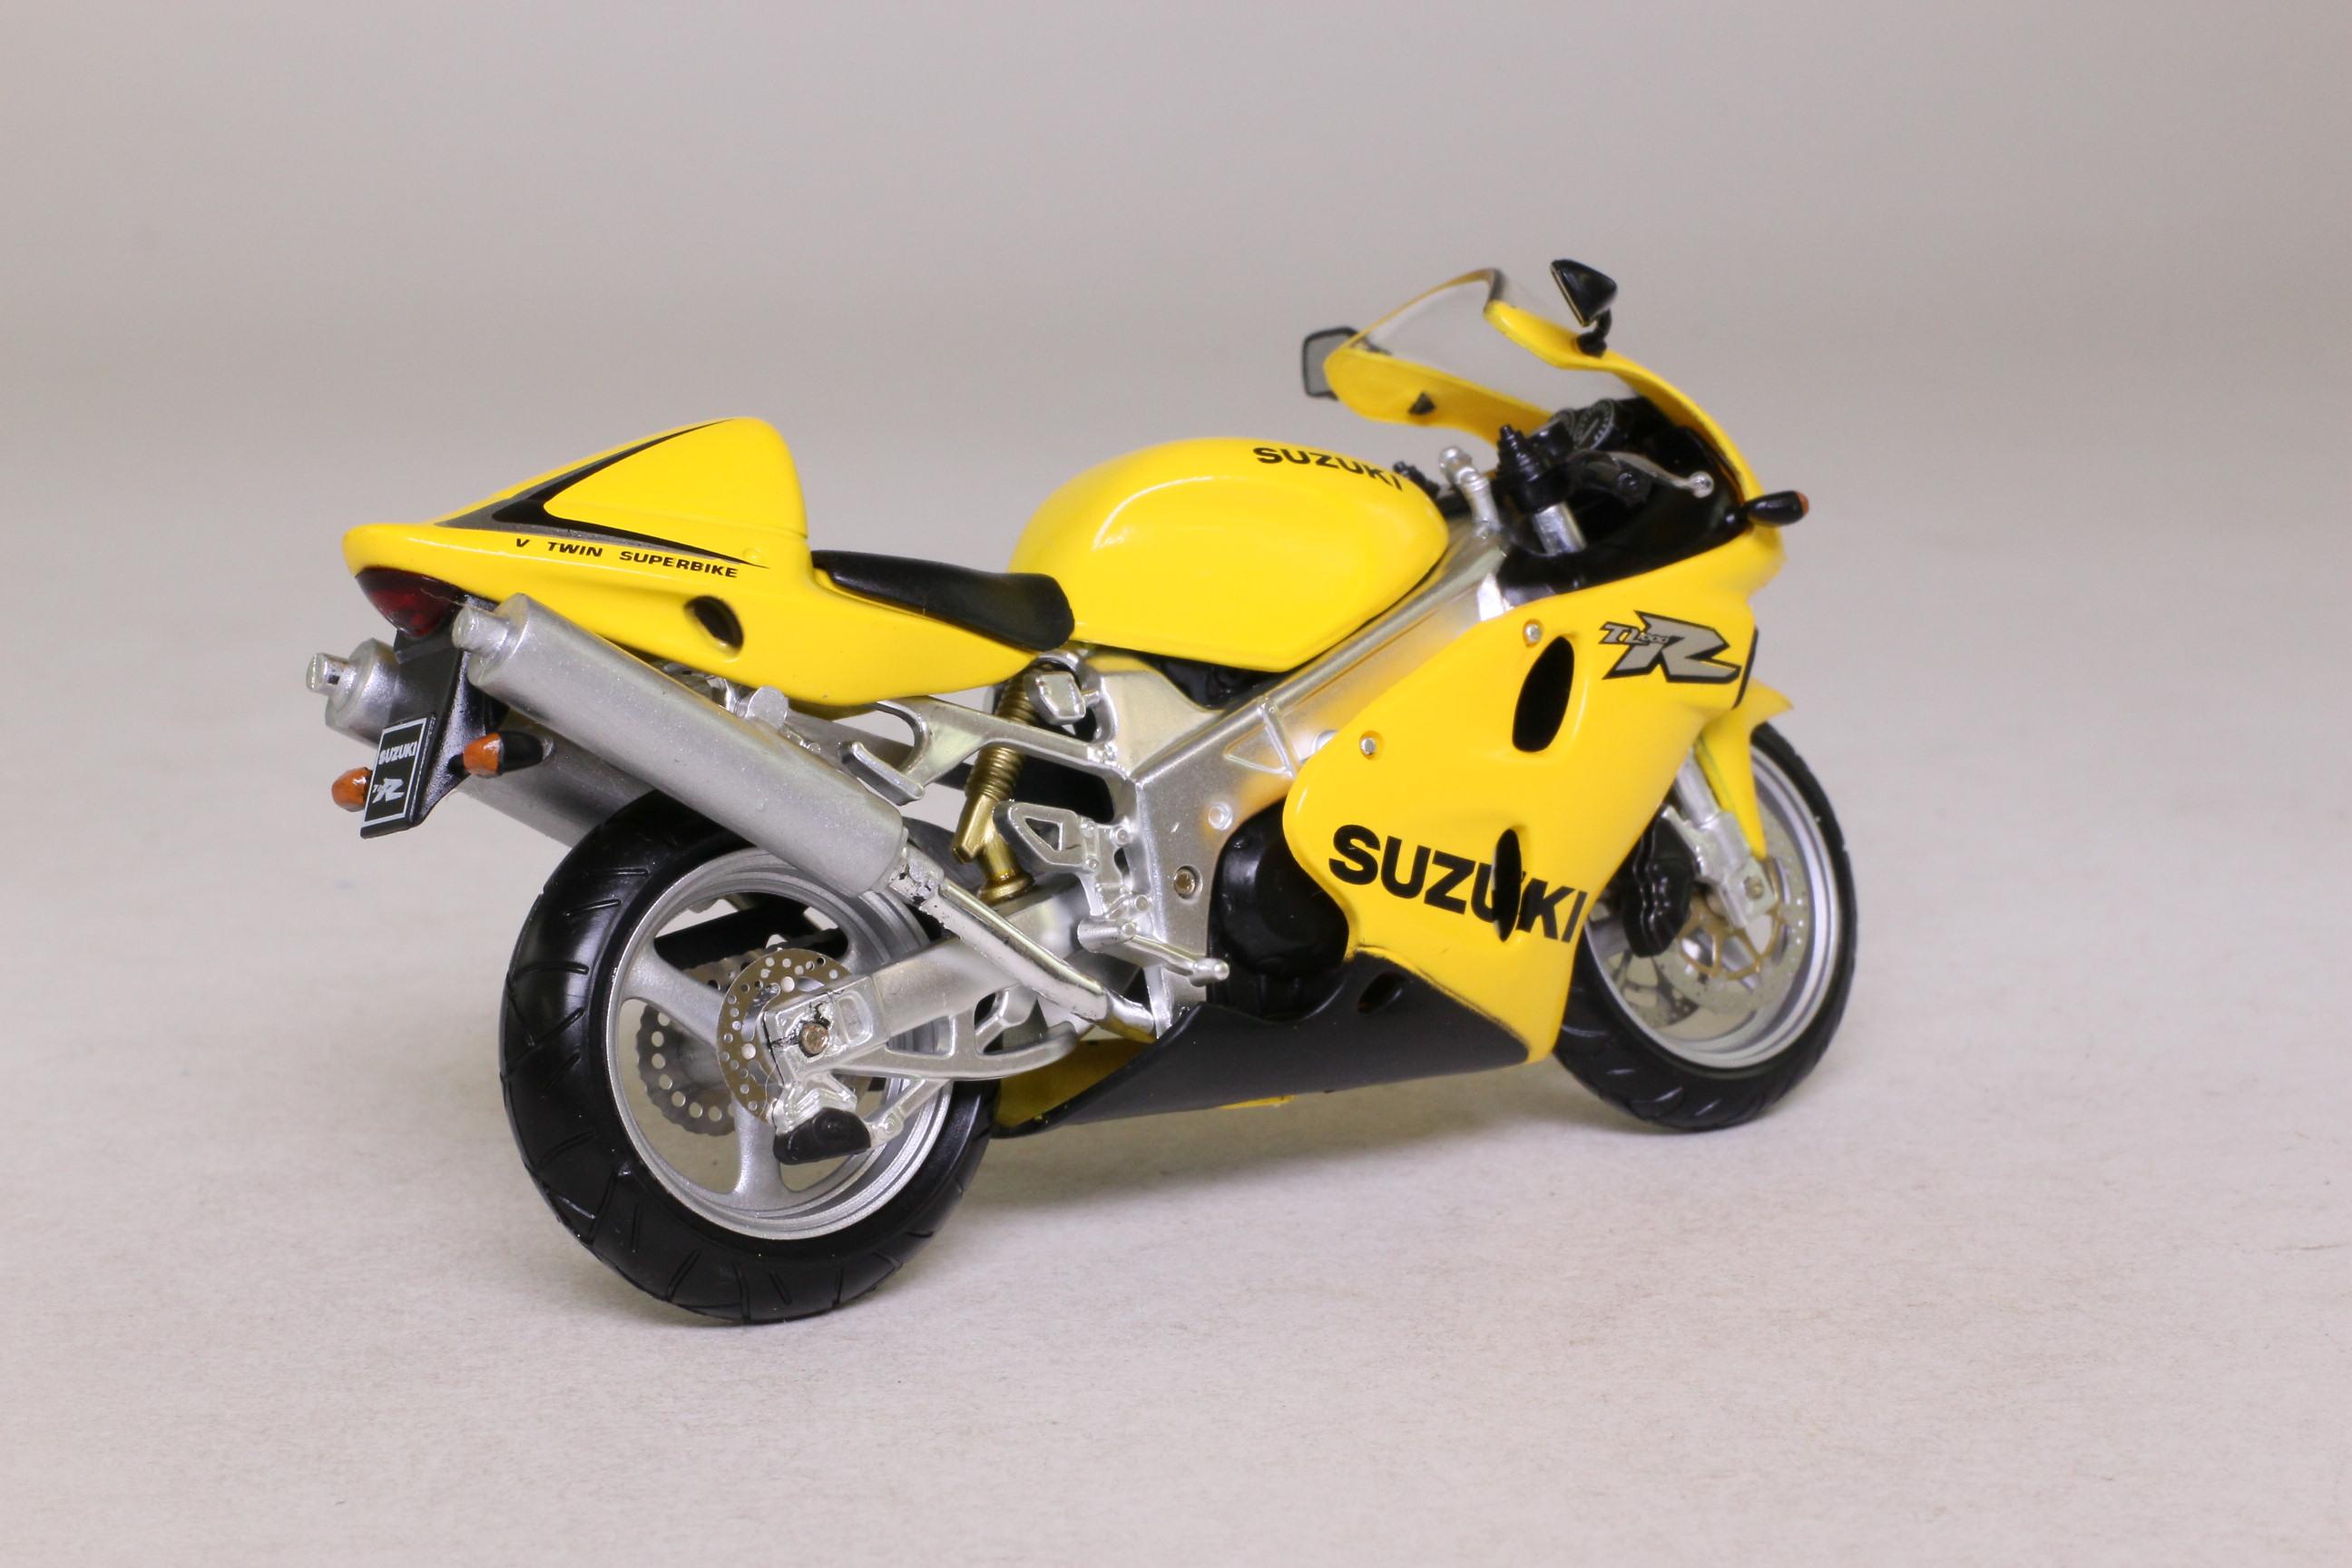 Suzuki Tl For Sale Ebay Uk